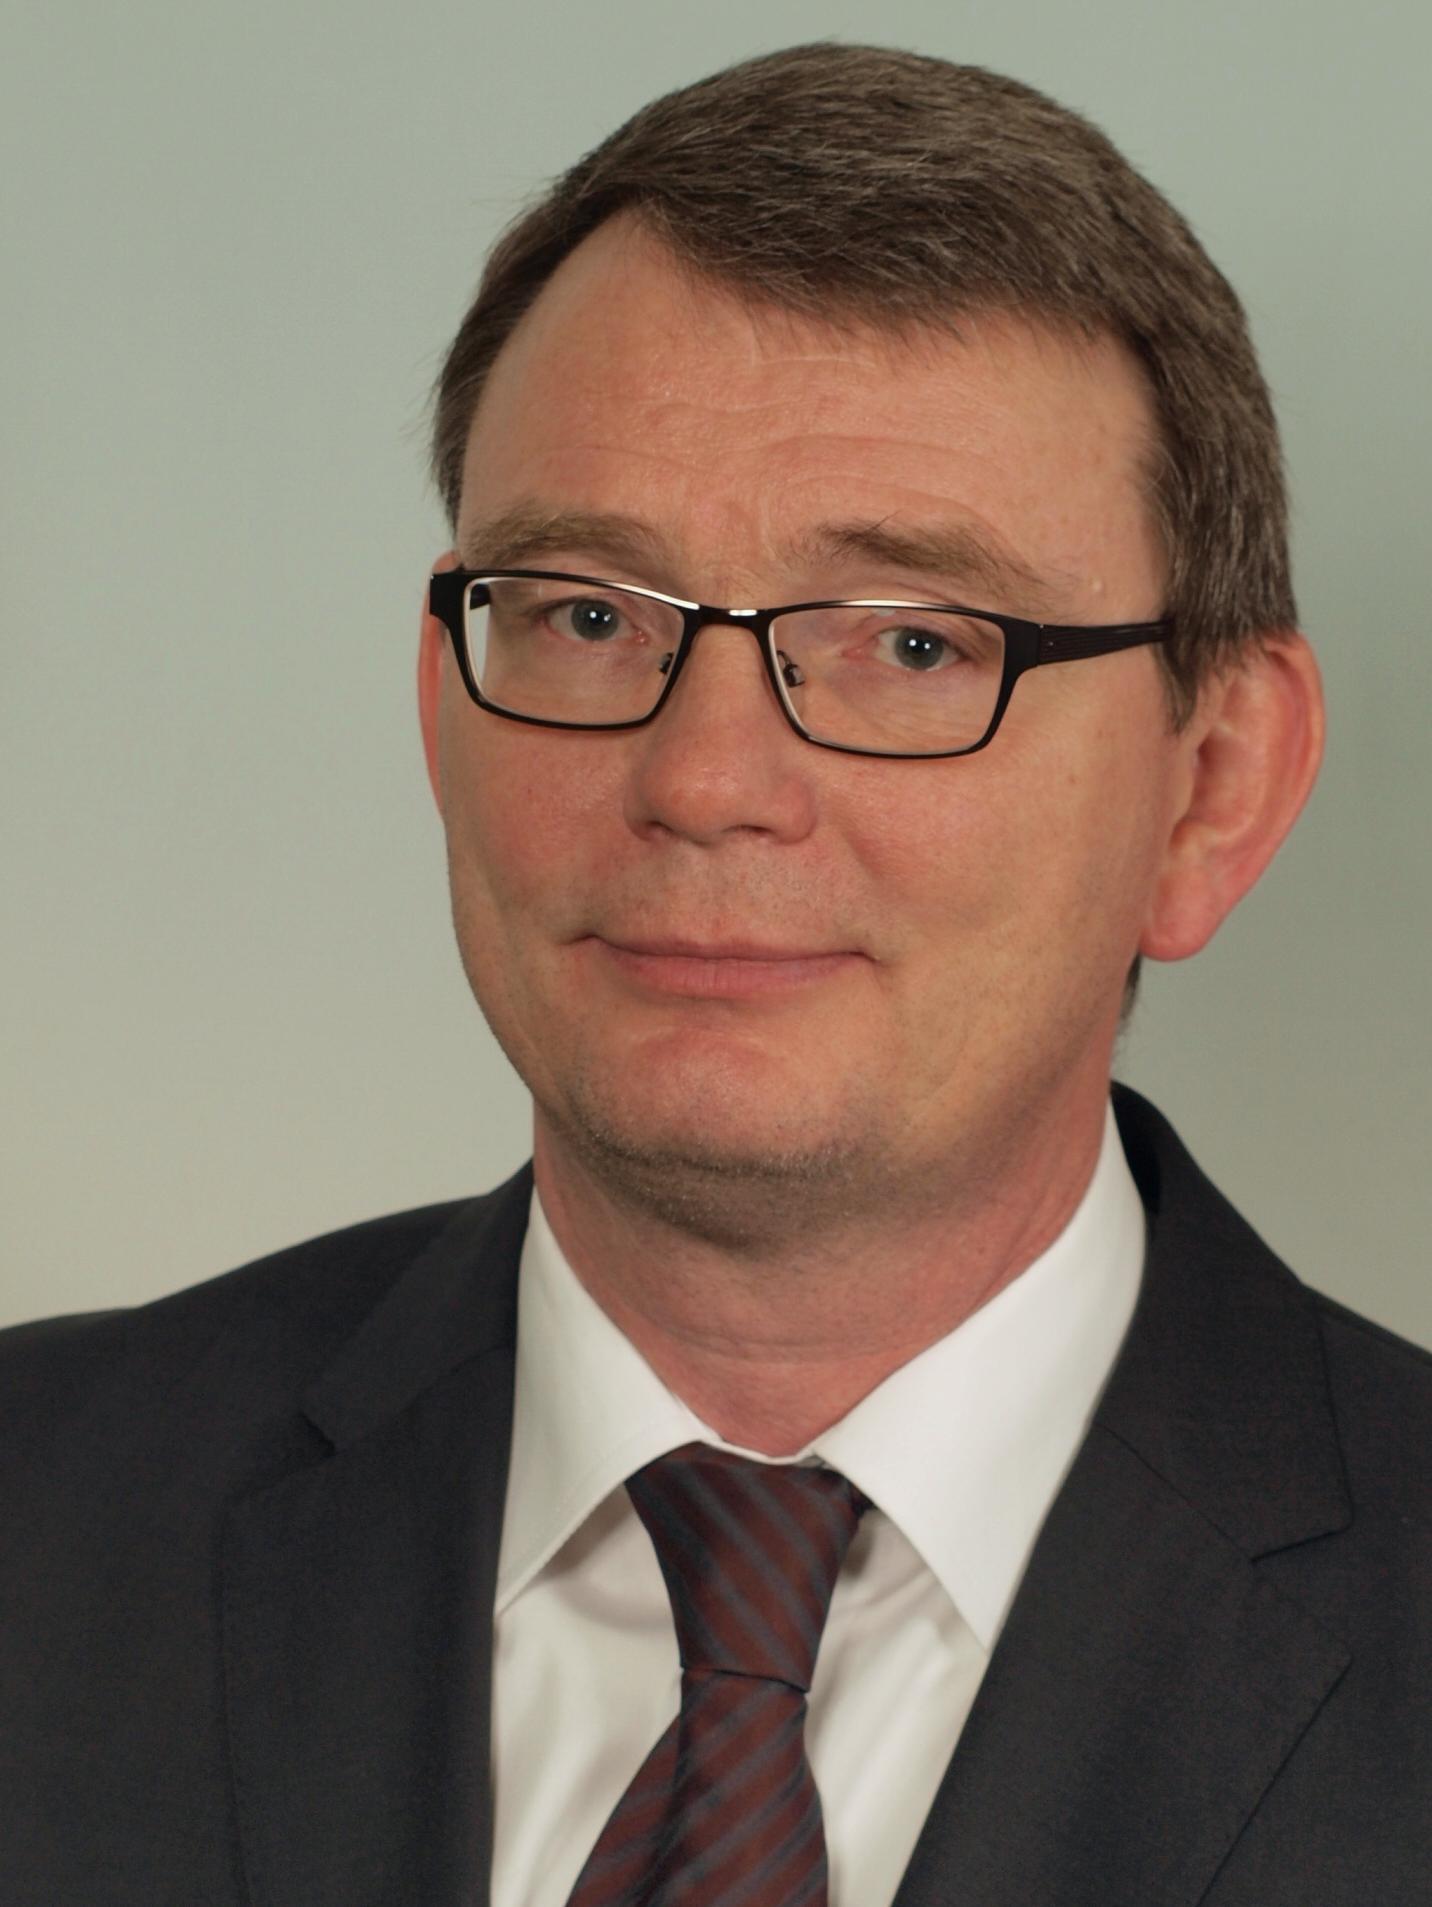 Stefan Öing, Leiter des Bereichs Track & Trace Software, Atlantic Zeiser